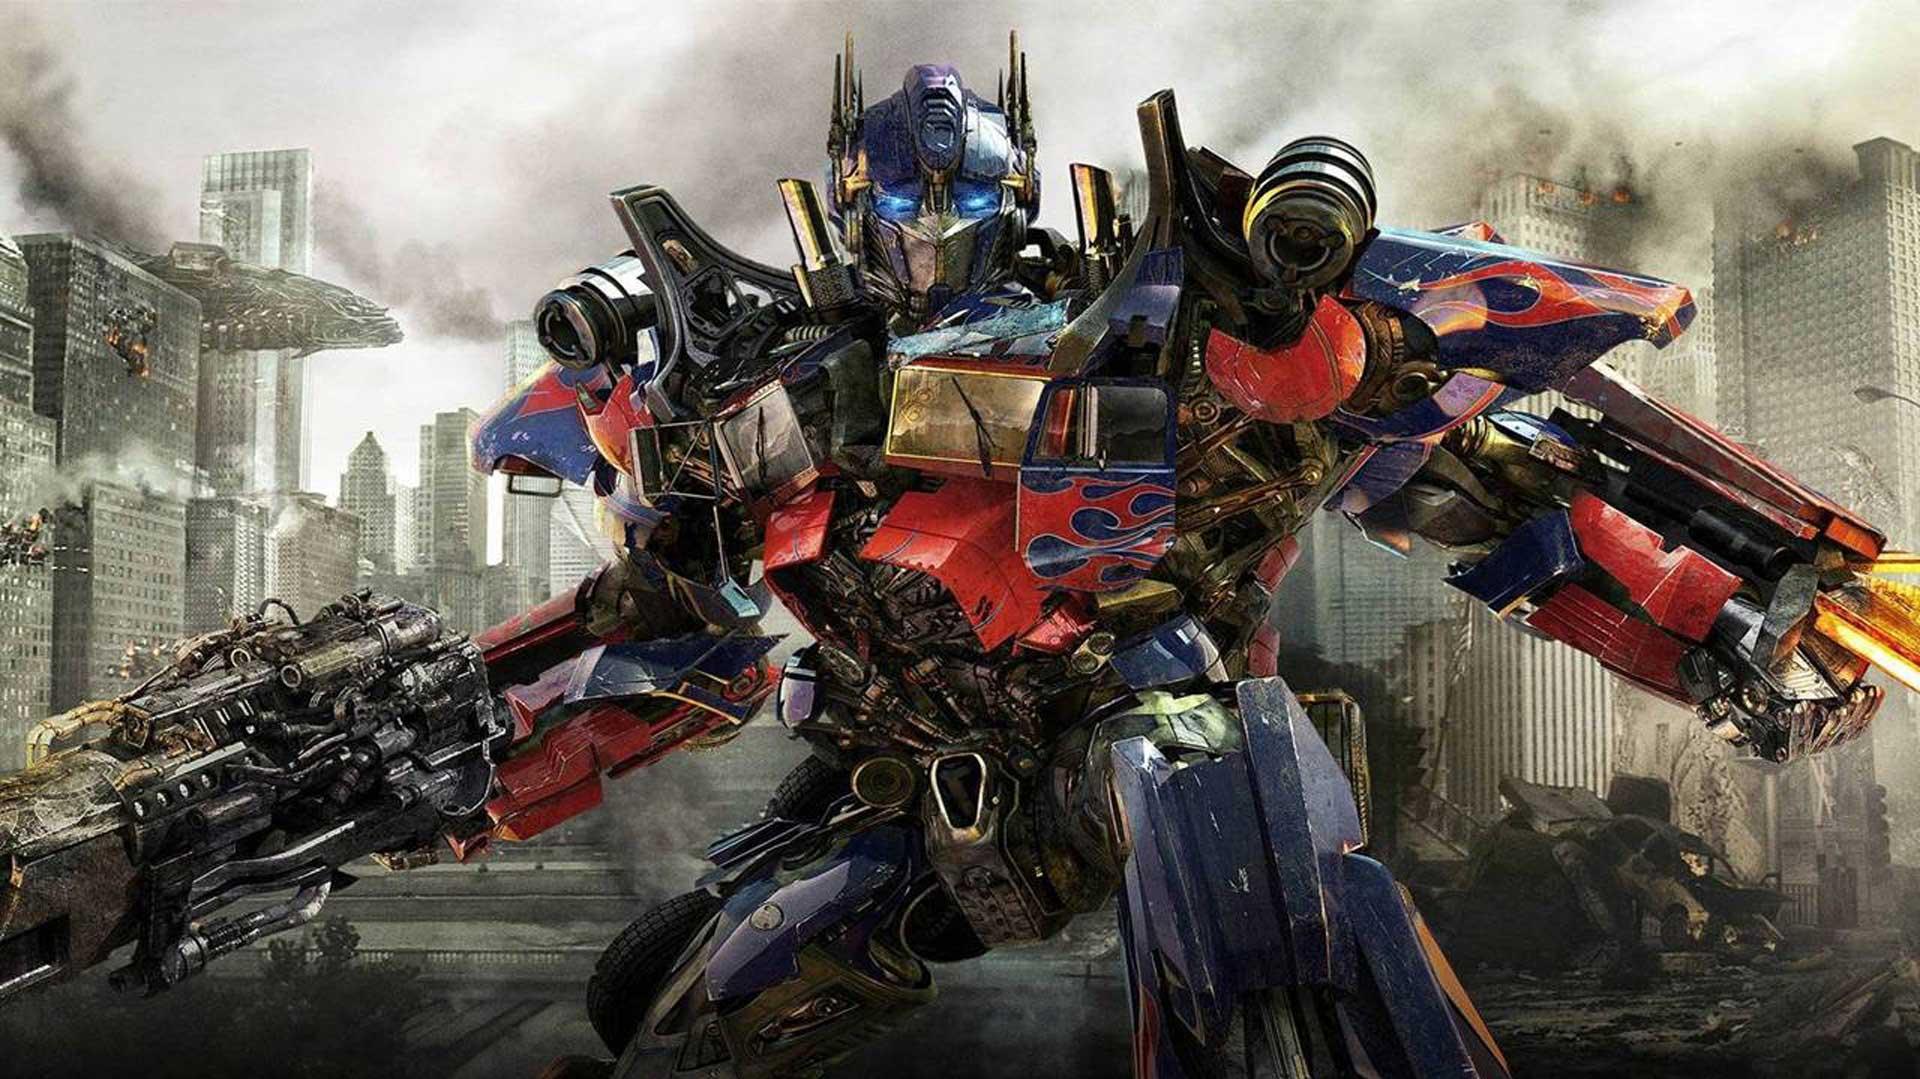 Youtube: Transformer zerstören gute Filme